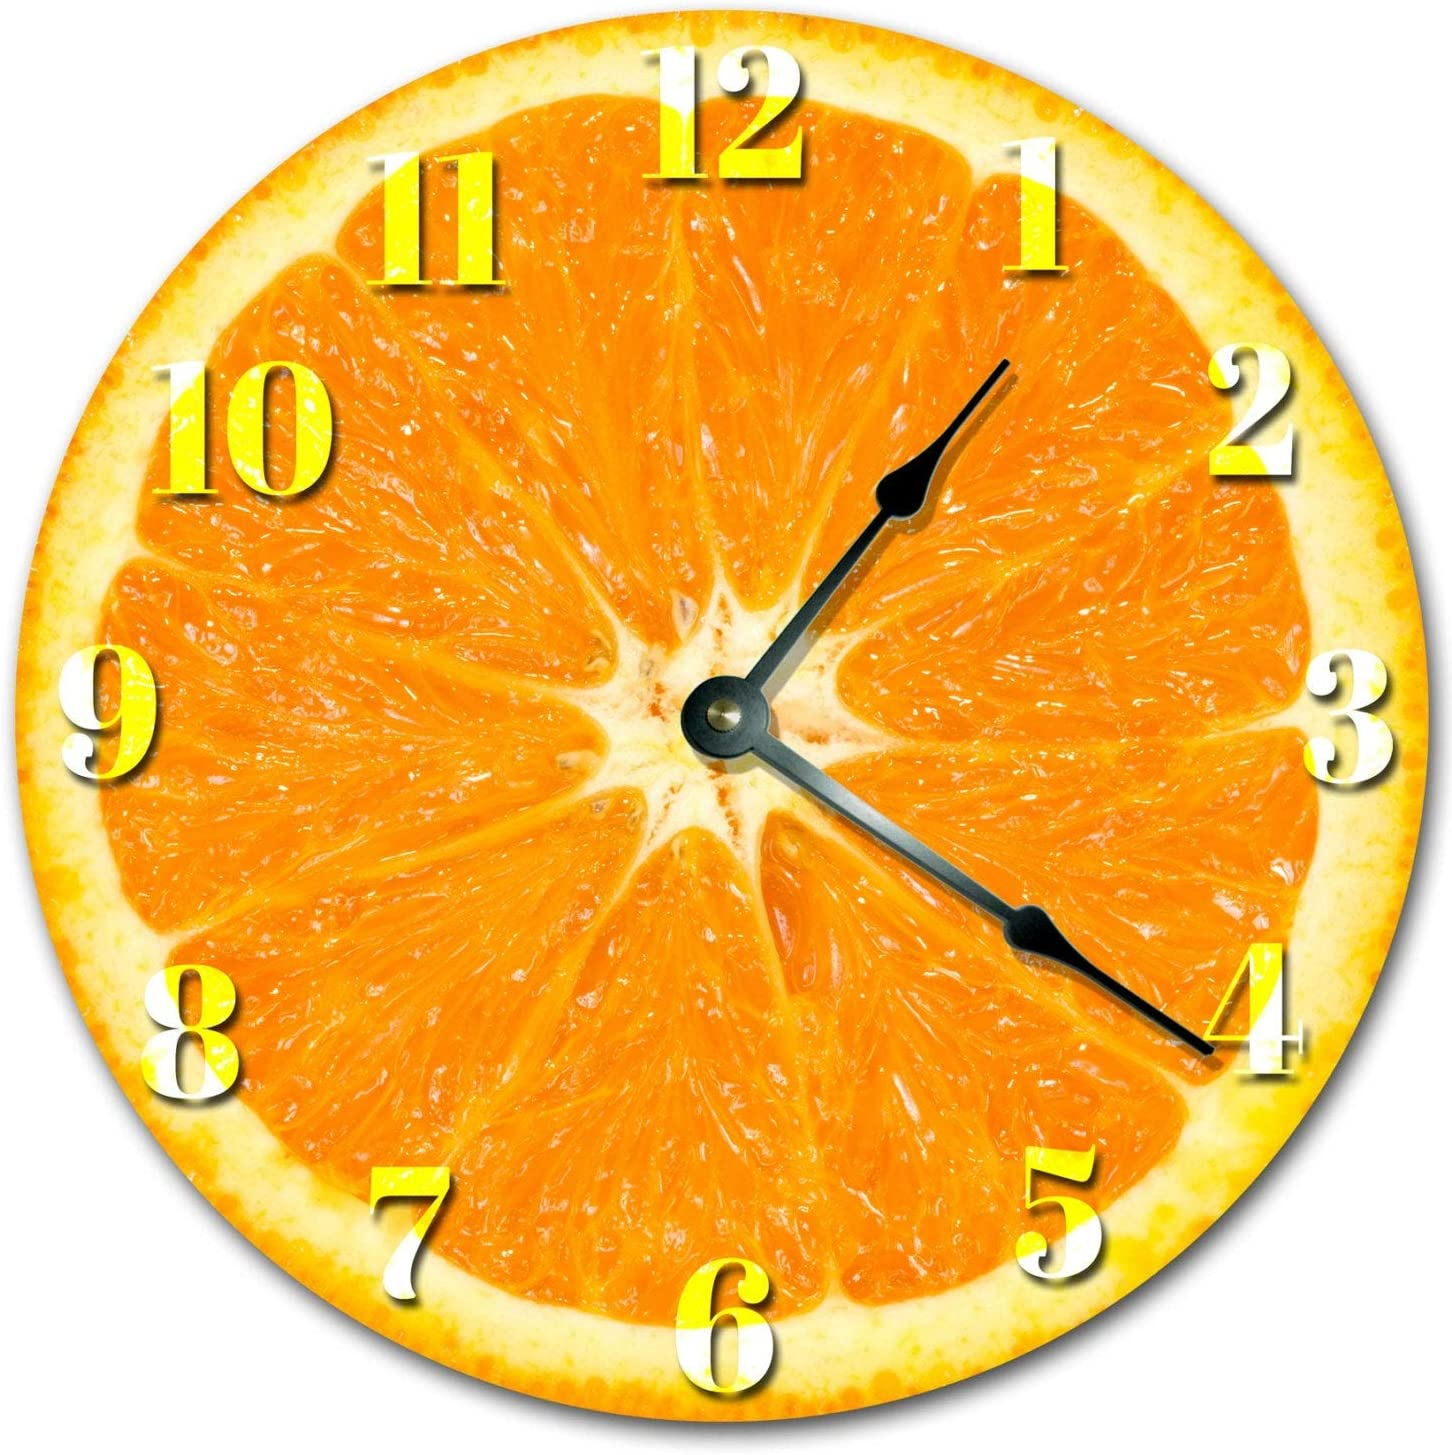 8Jo6Poe Orange Fruit Kitchen Clock Large 12 inch Clock Novelty Clocks Wall Clocks Round Clock, Food Clock, Kitchen Clock 2019